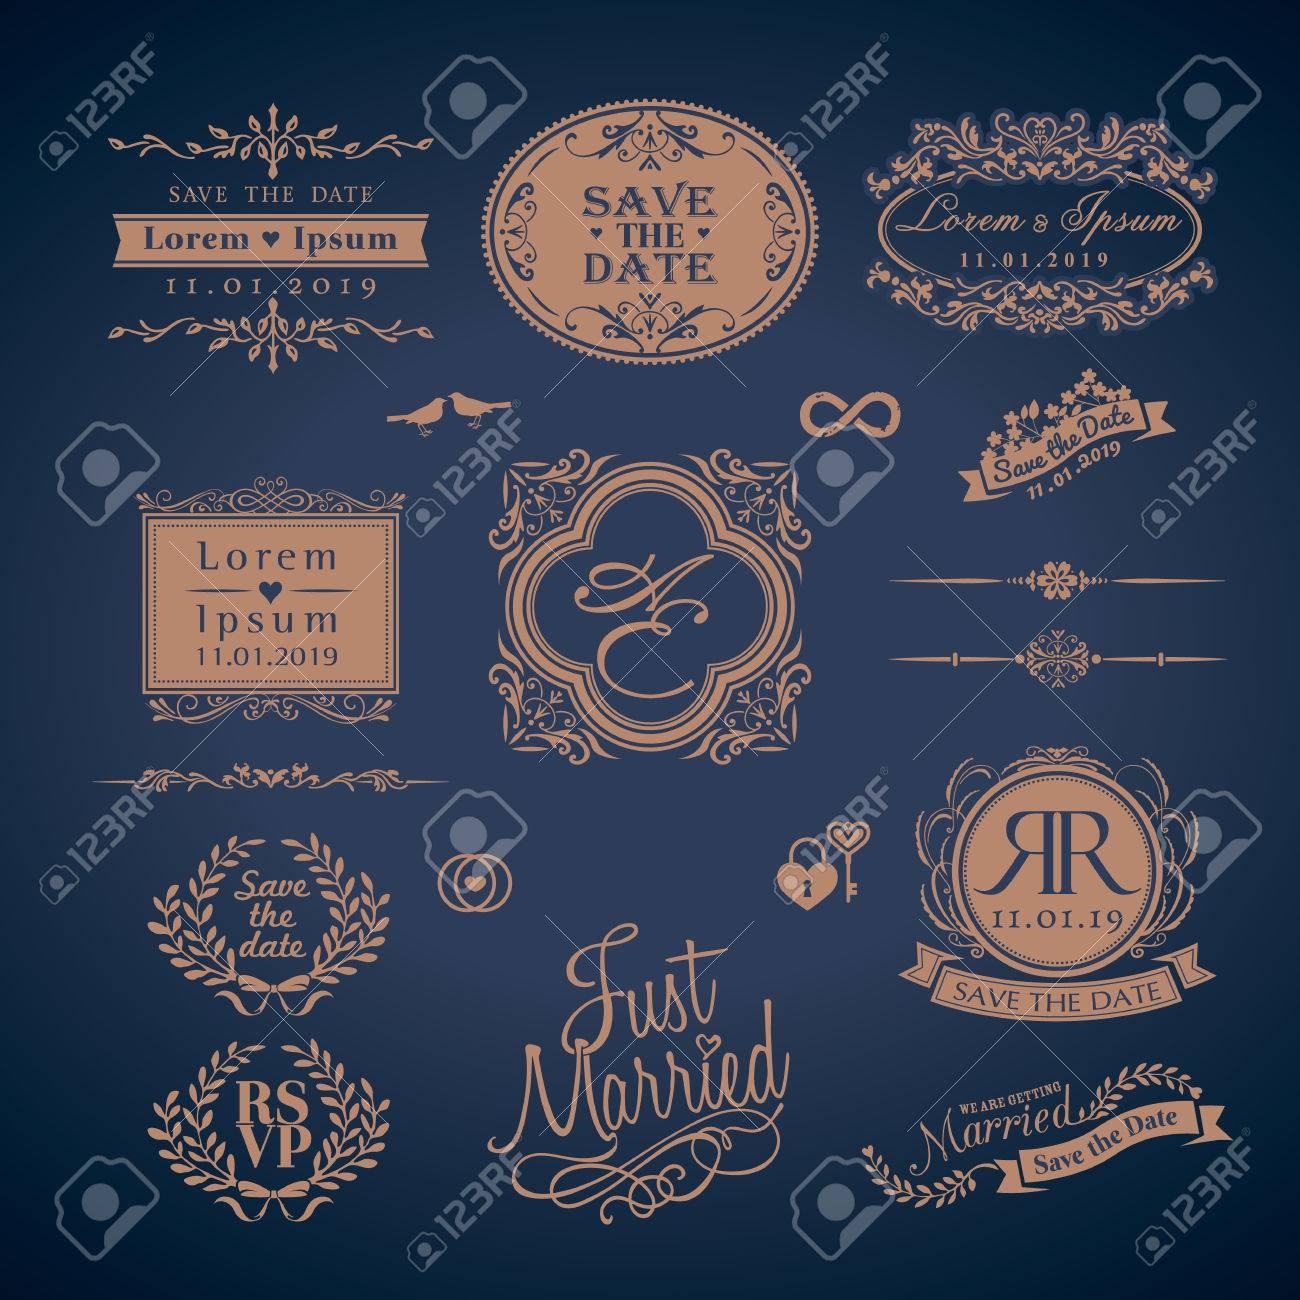 Vintage Style Wedding Monogram symbol border and frames - 31706129